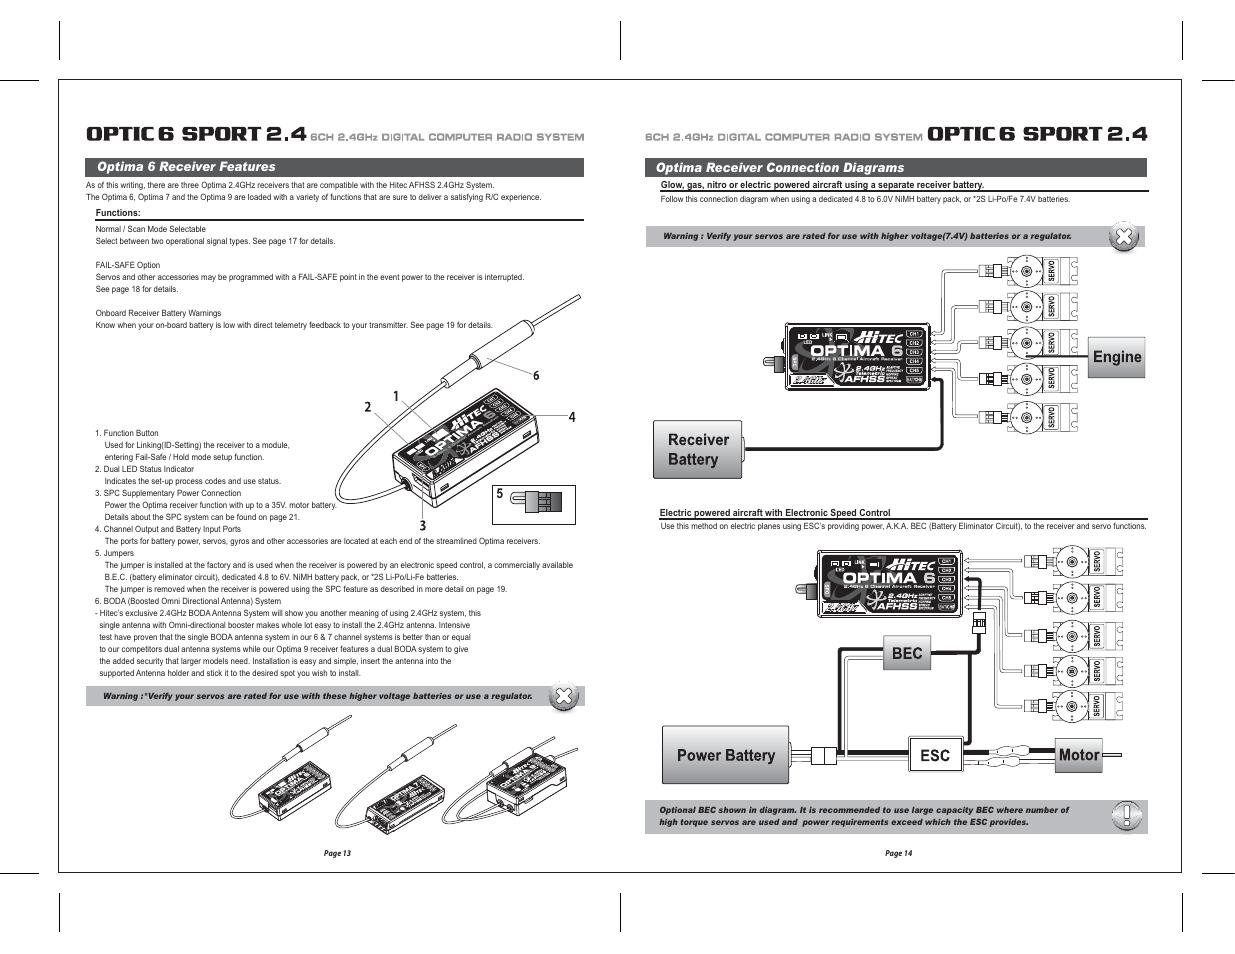 Hitec Optic 6 Sport 24 User Manual Page 8 30 Regulator To Provide The Bec Battery Eliminator Circuit Function